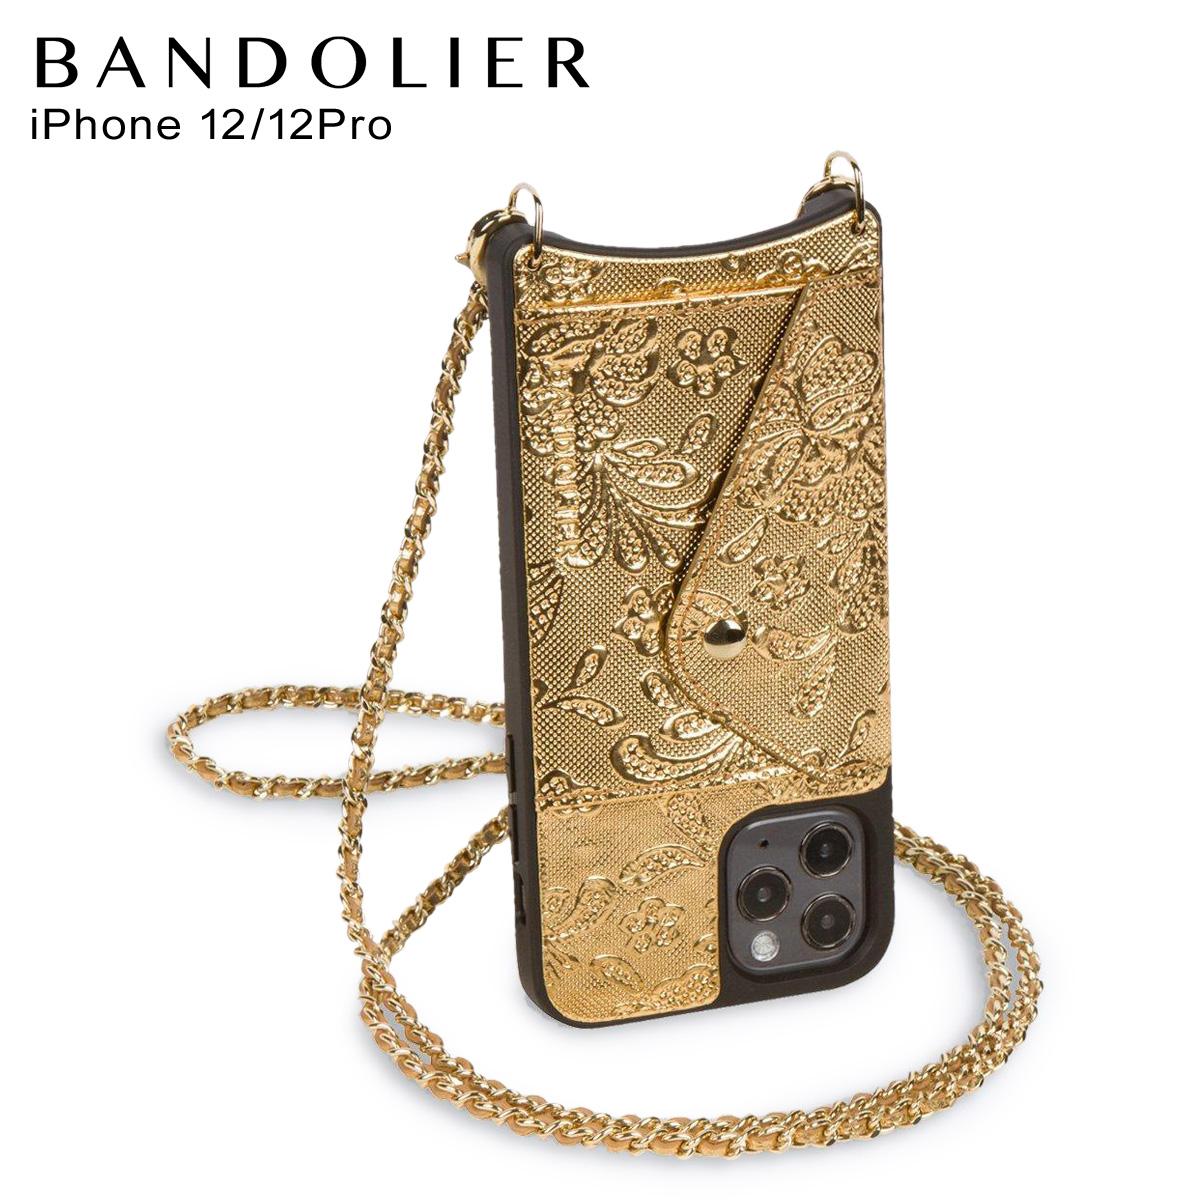 BANDOLIER正規代理店 送料無料 あす楽対応 バンドリヤー BANDOLIER iPhone12 12 Pro ケース スマホ 携帯 ショルダー アイフォン 最大1000OFFクーポン スロット LACE LILY ゴールド SLOT リリー 14LIGLDG GOLD サイド 大規模セール レディース 贈答品 メンズ レース SIDE